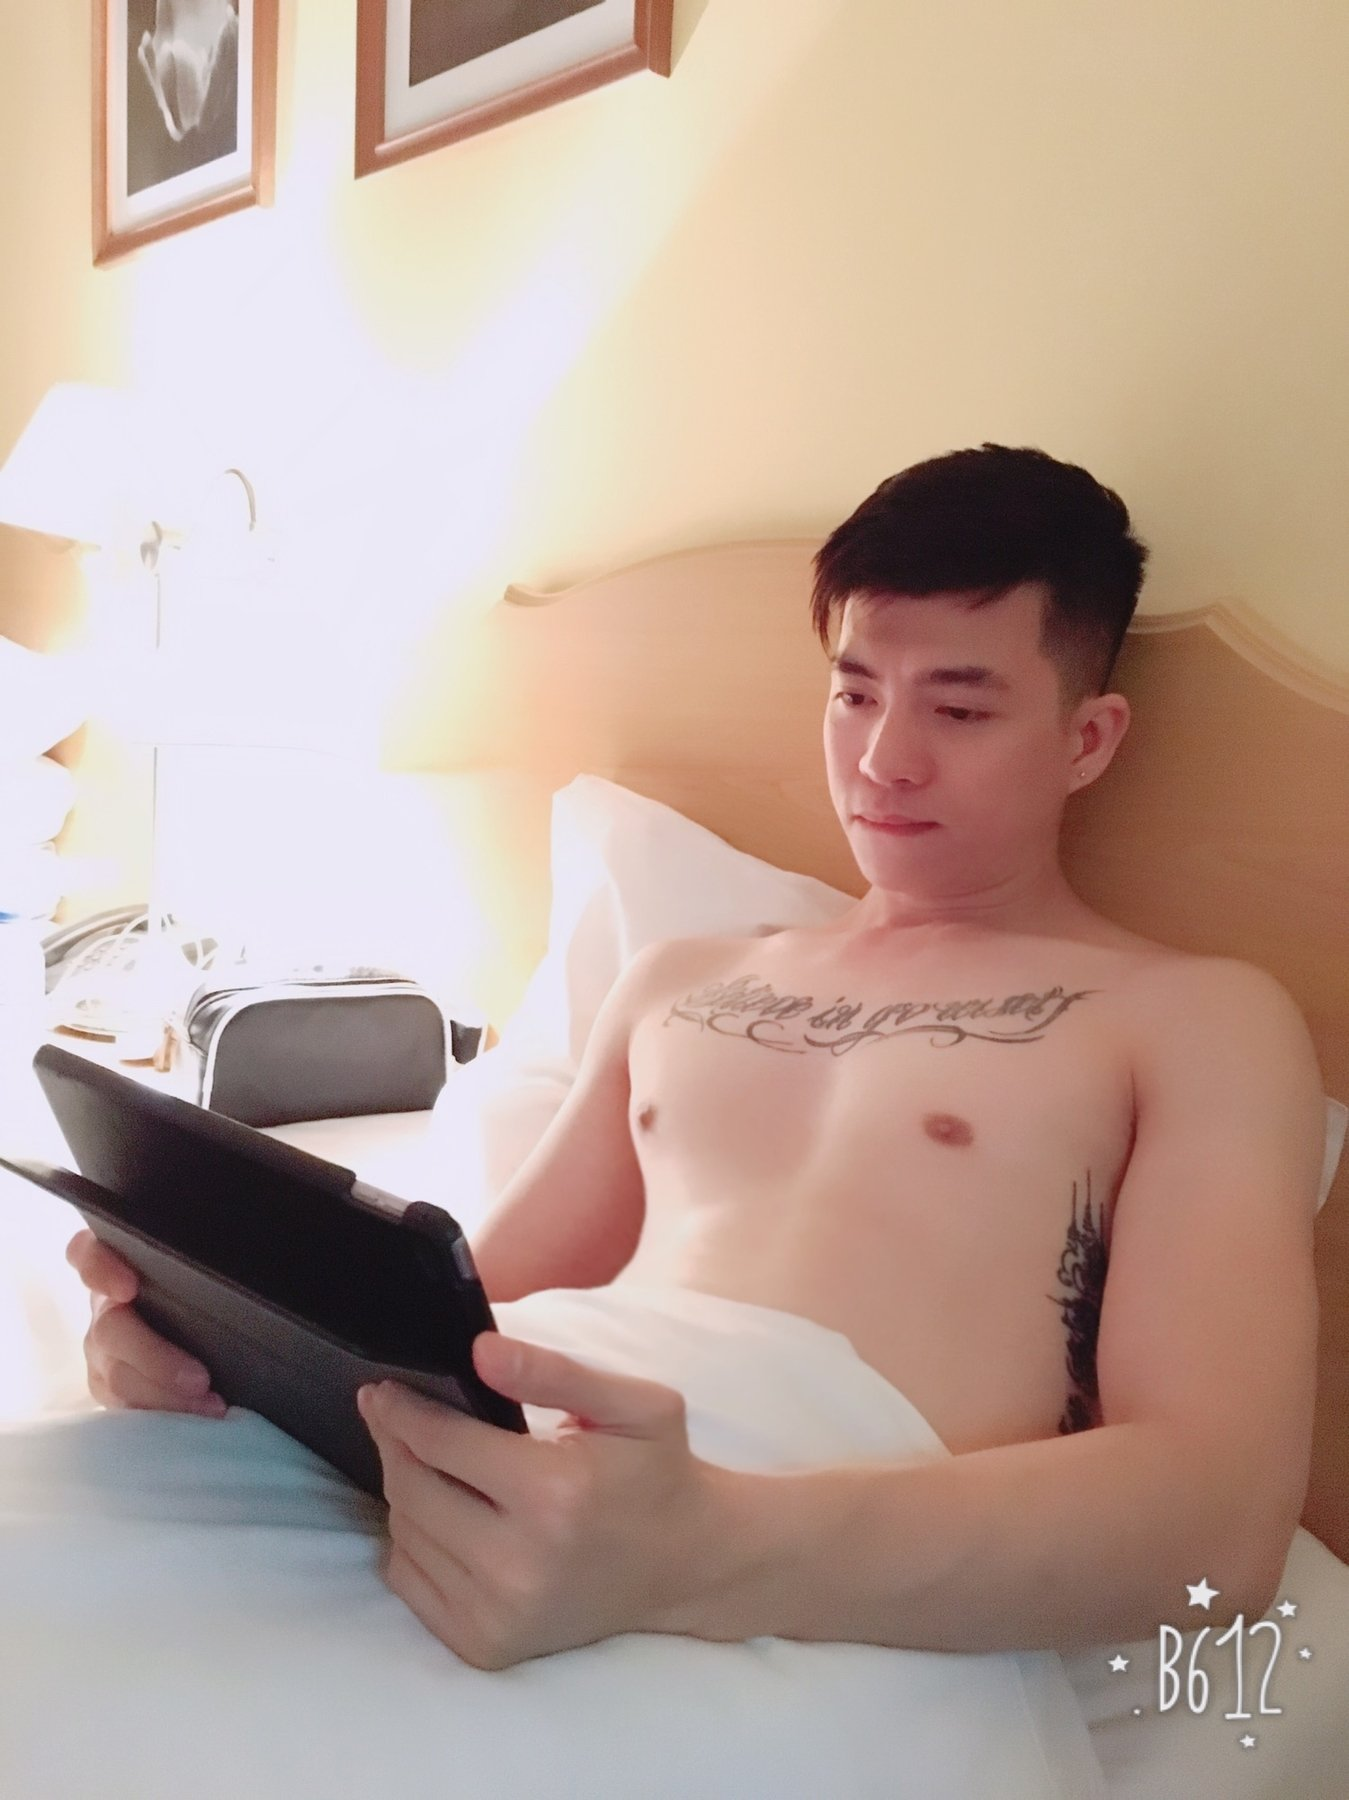 vip escort video varese gay